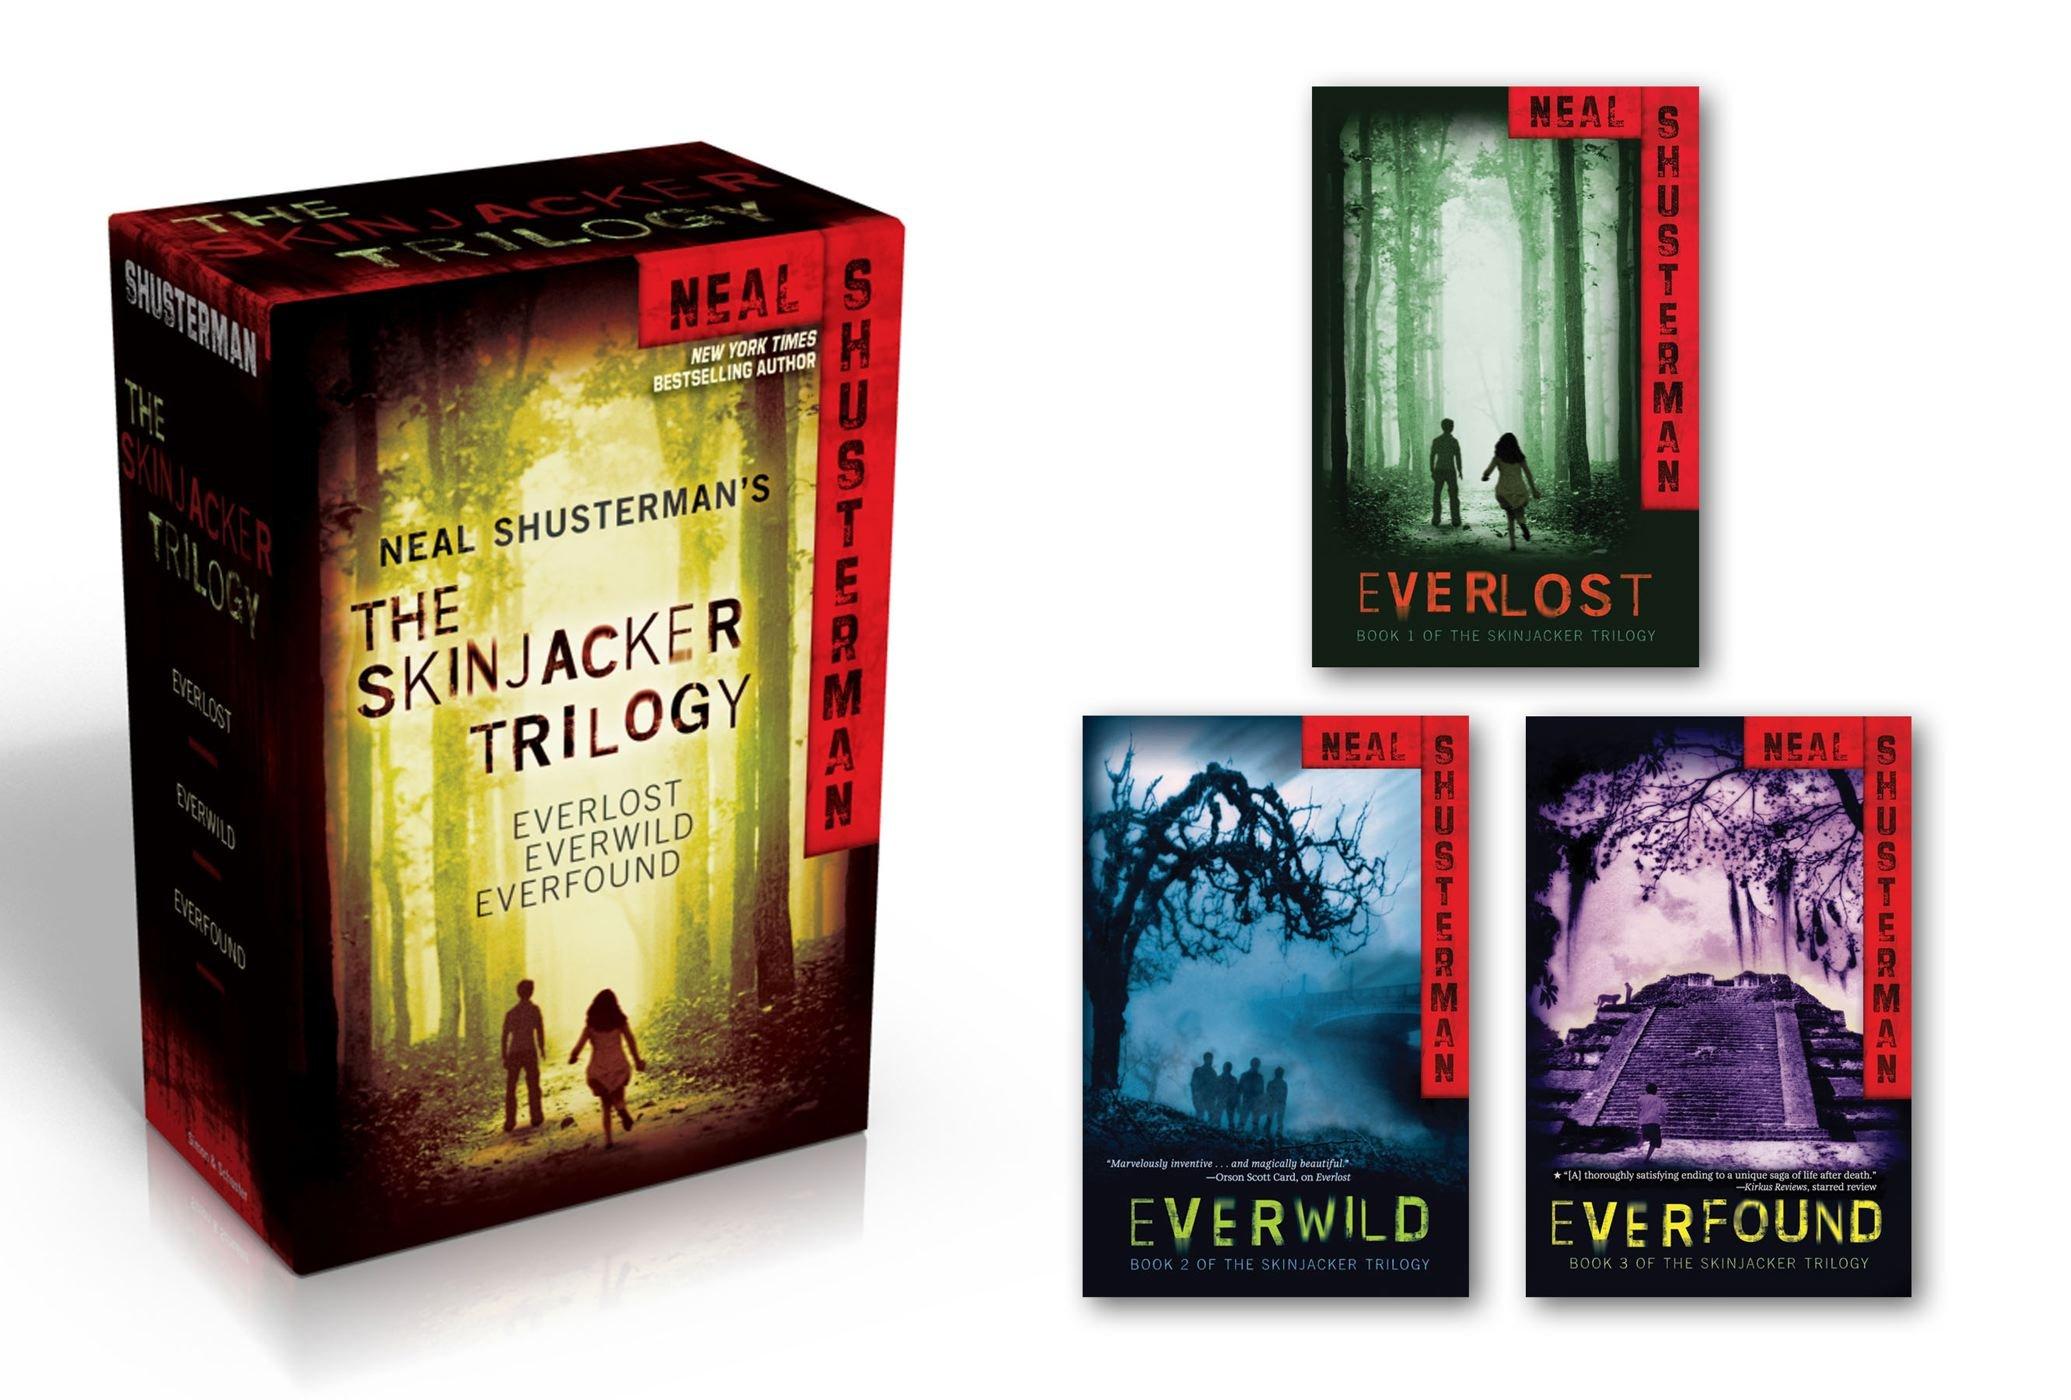 Amazon: The Skinjacker Trilogy: Everlost; Everwild; Everfound  (9781442499034): Neal Shusterman: Books